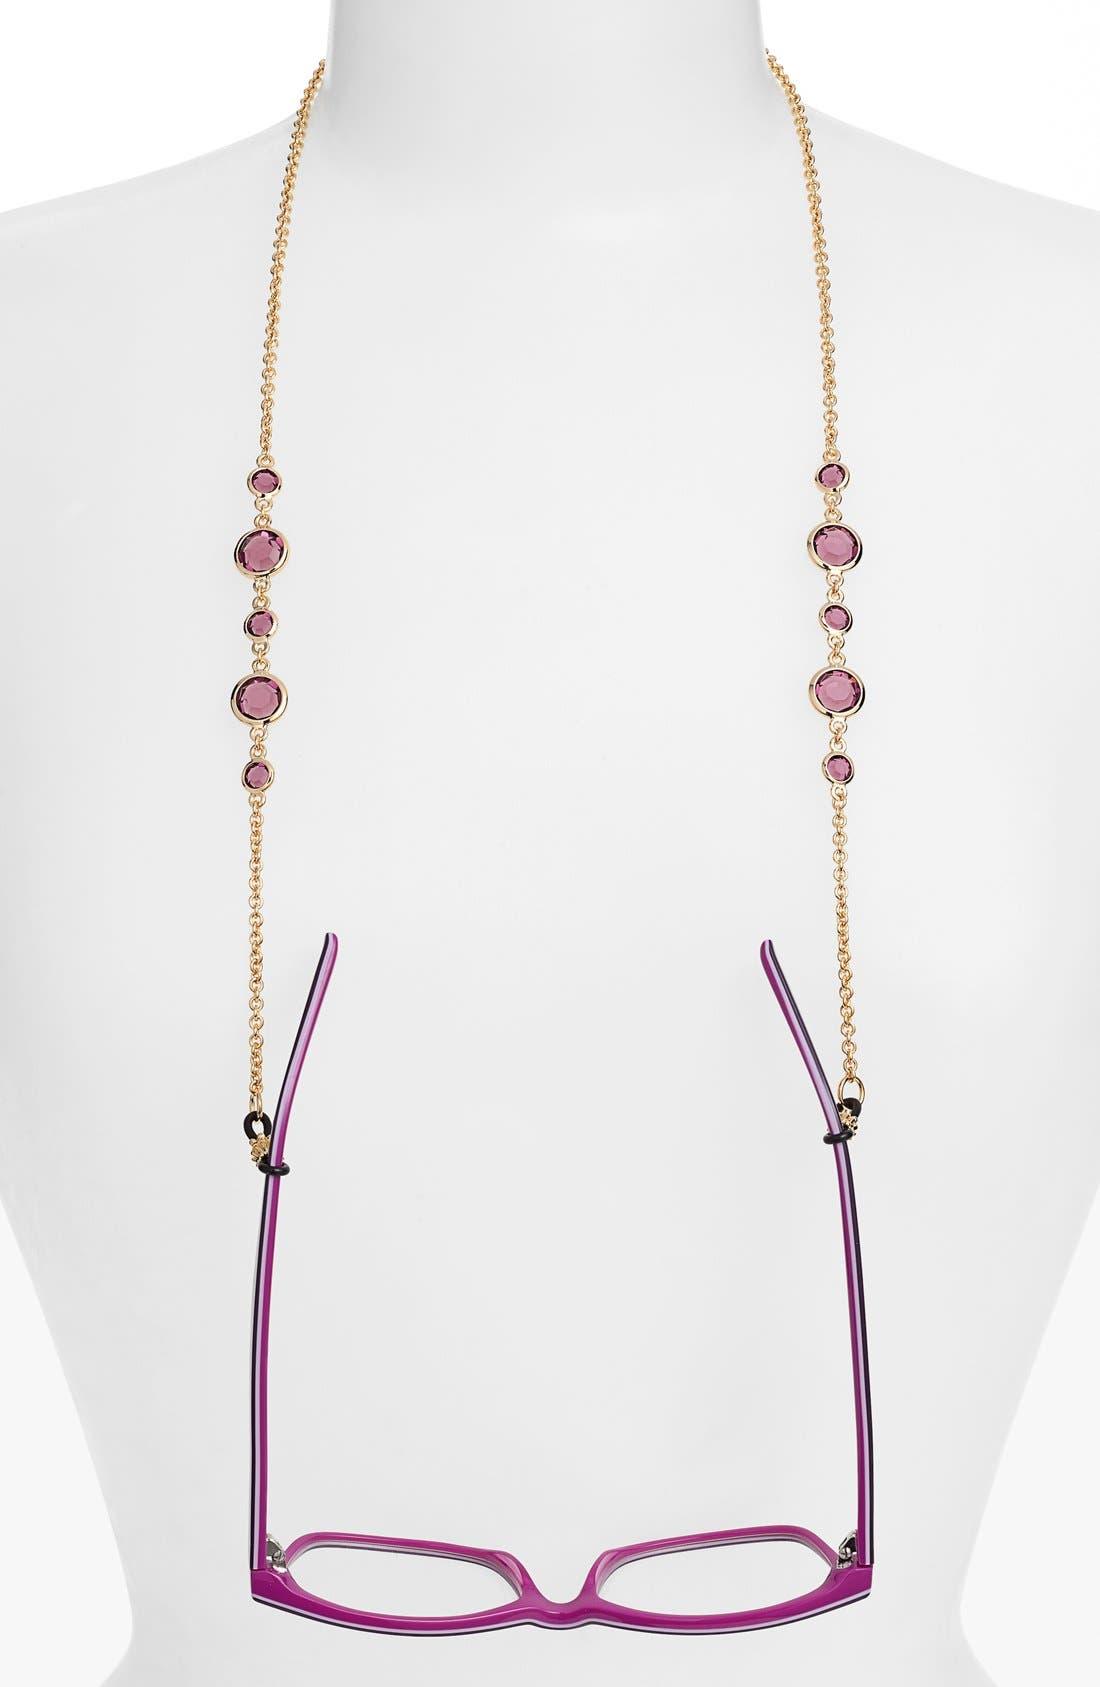 L. Erickson 'Daphanie' Eyeglass Chain